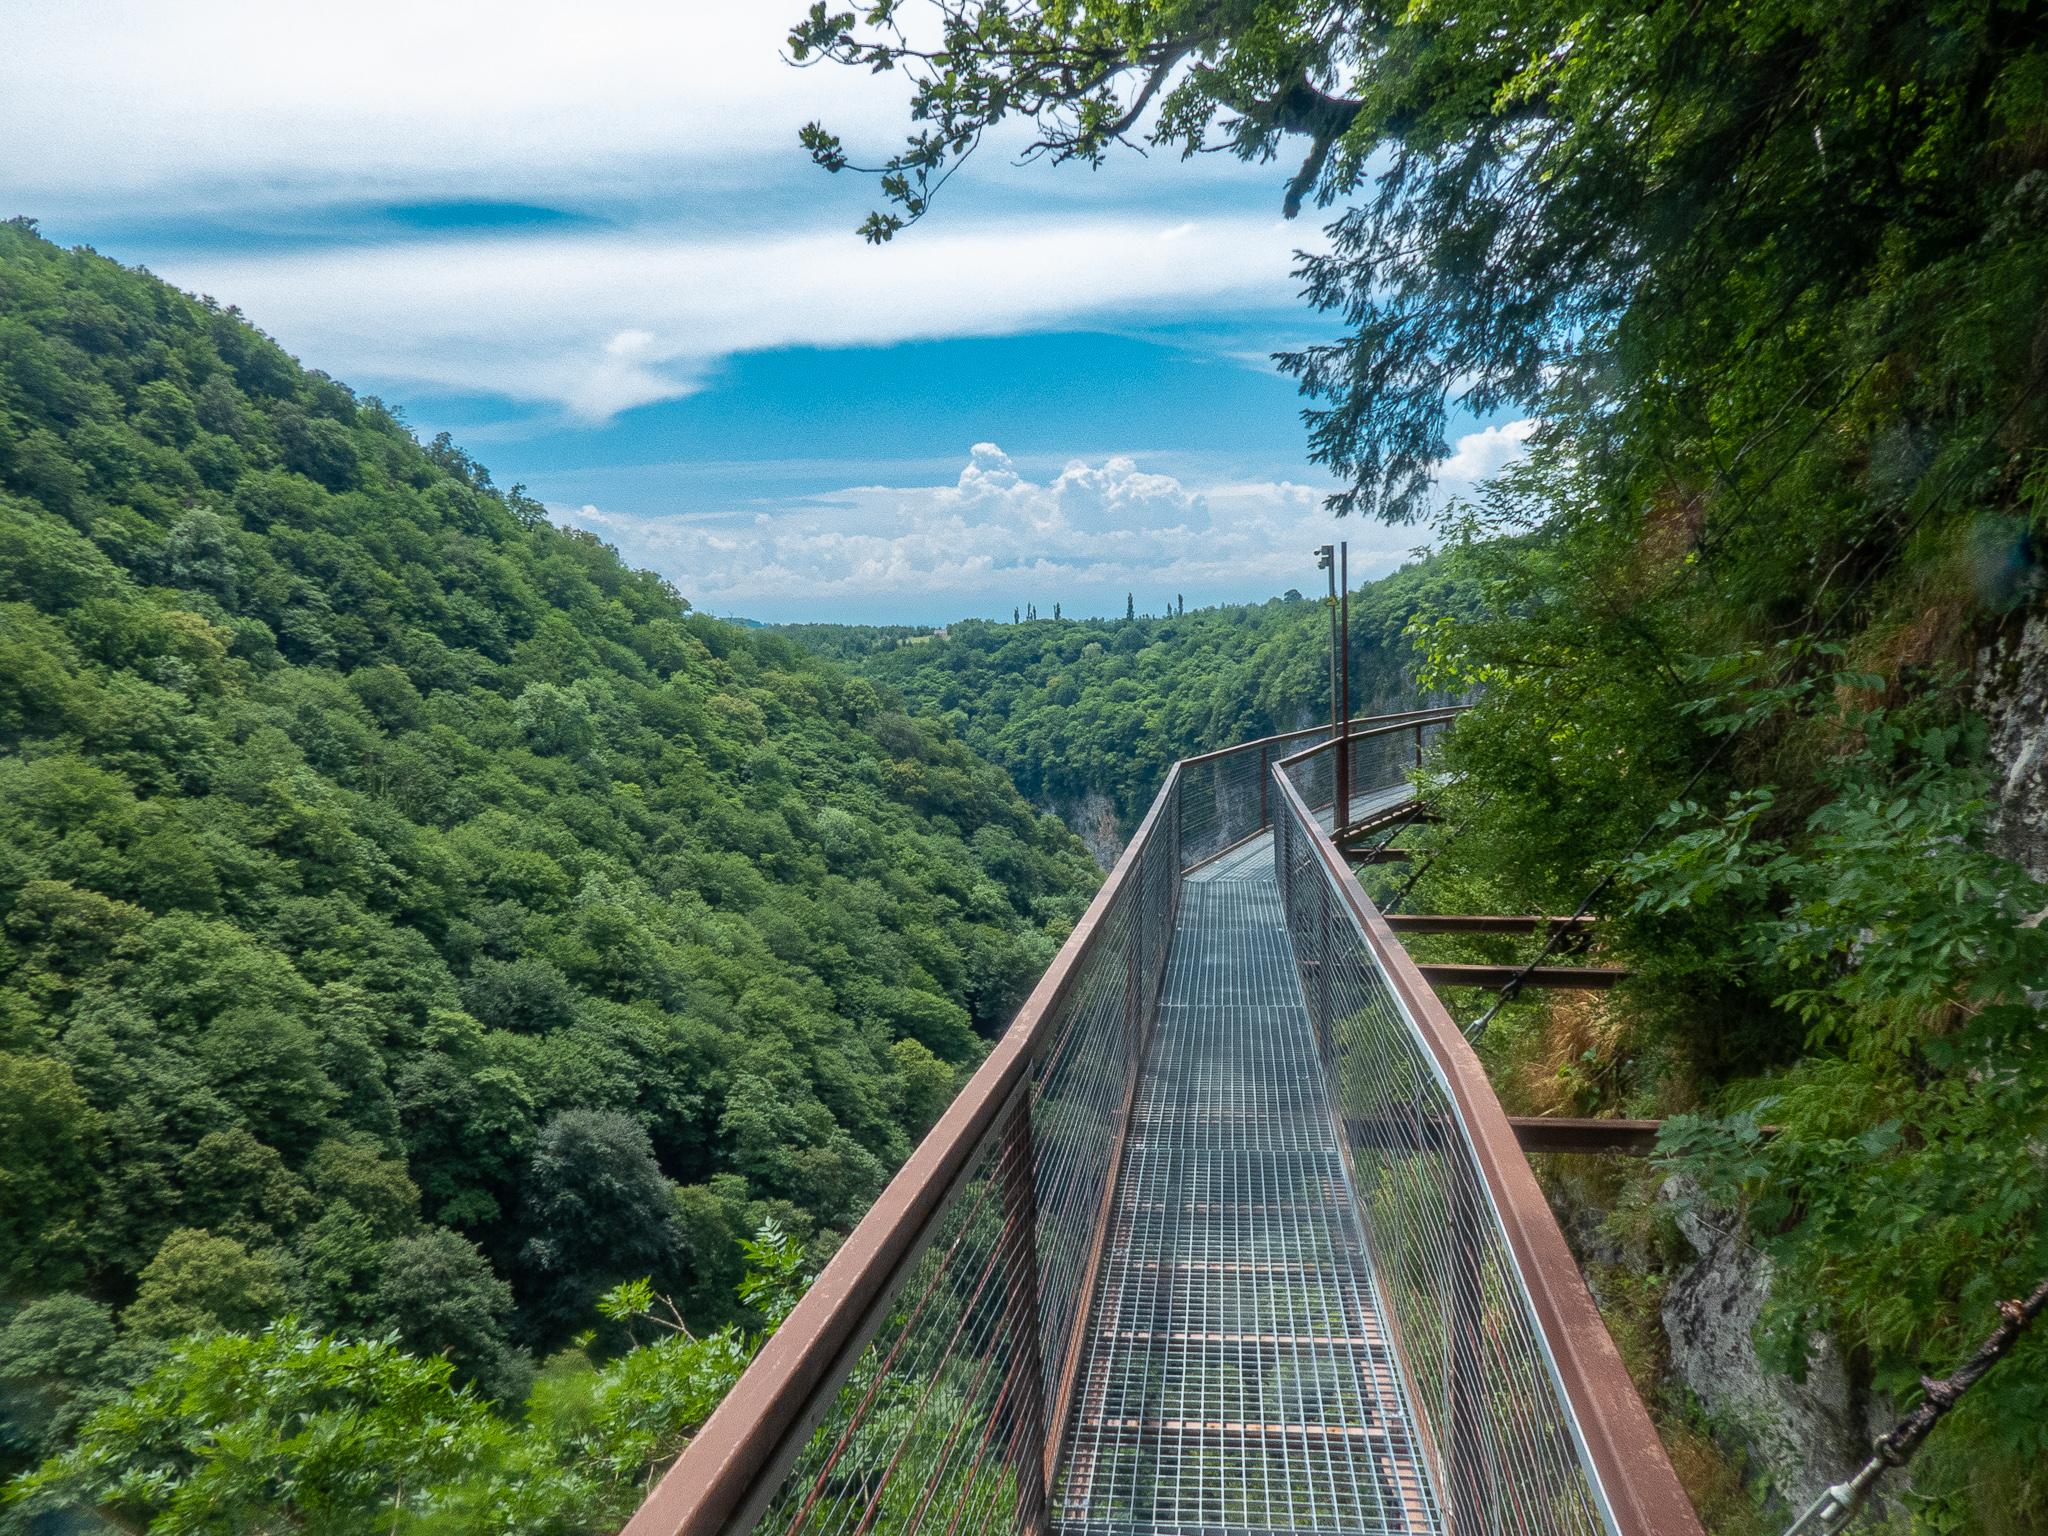 The suspension walkway